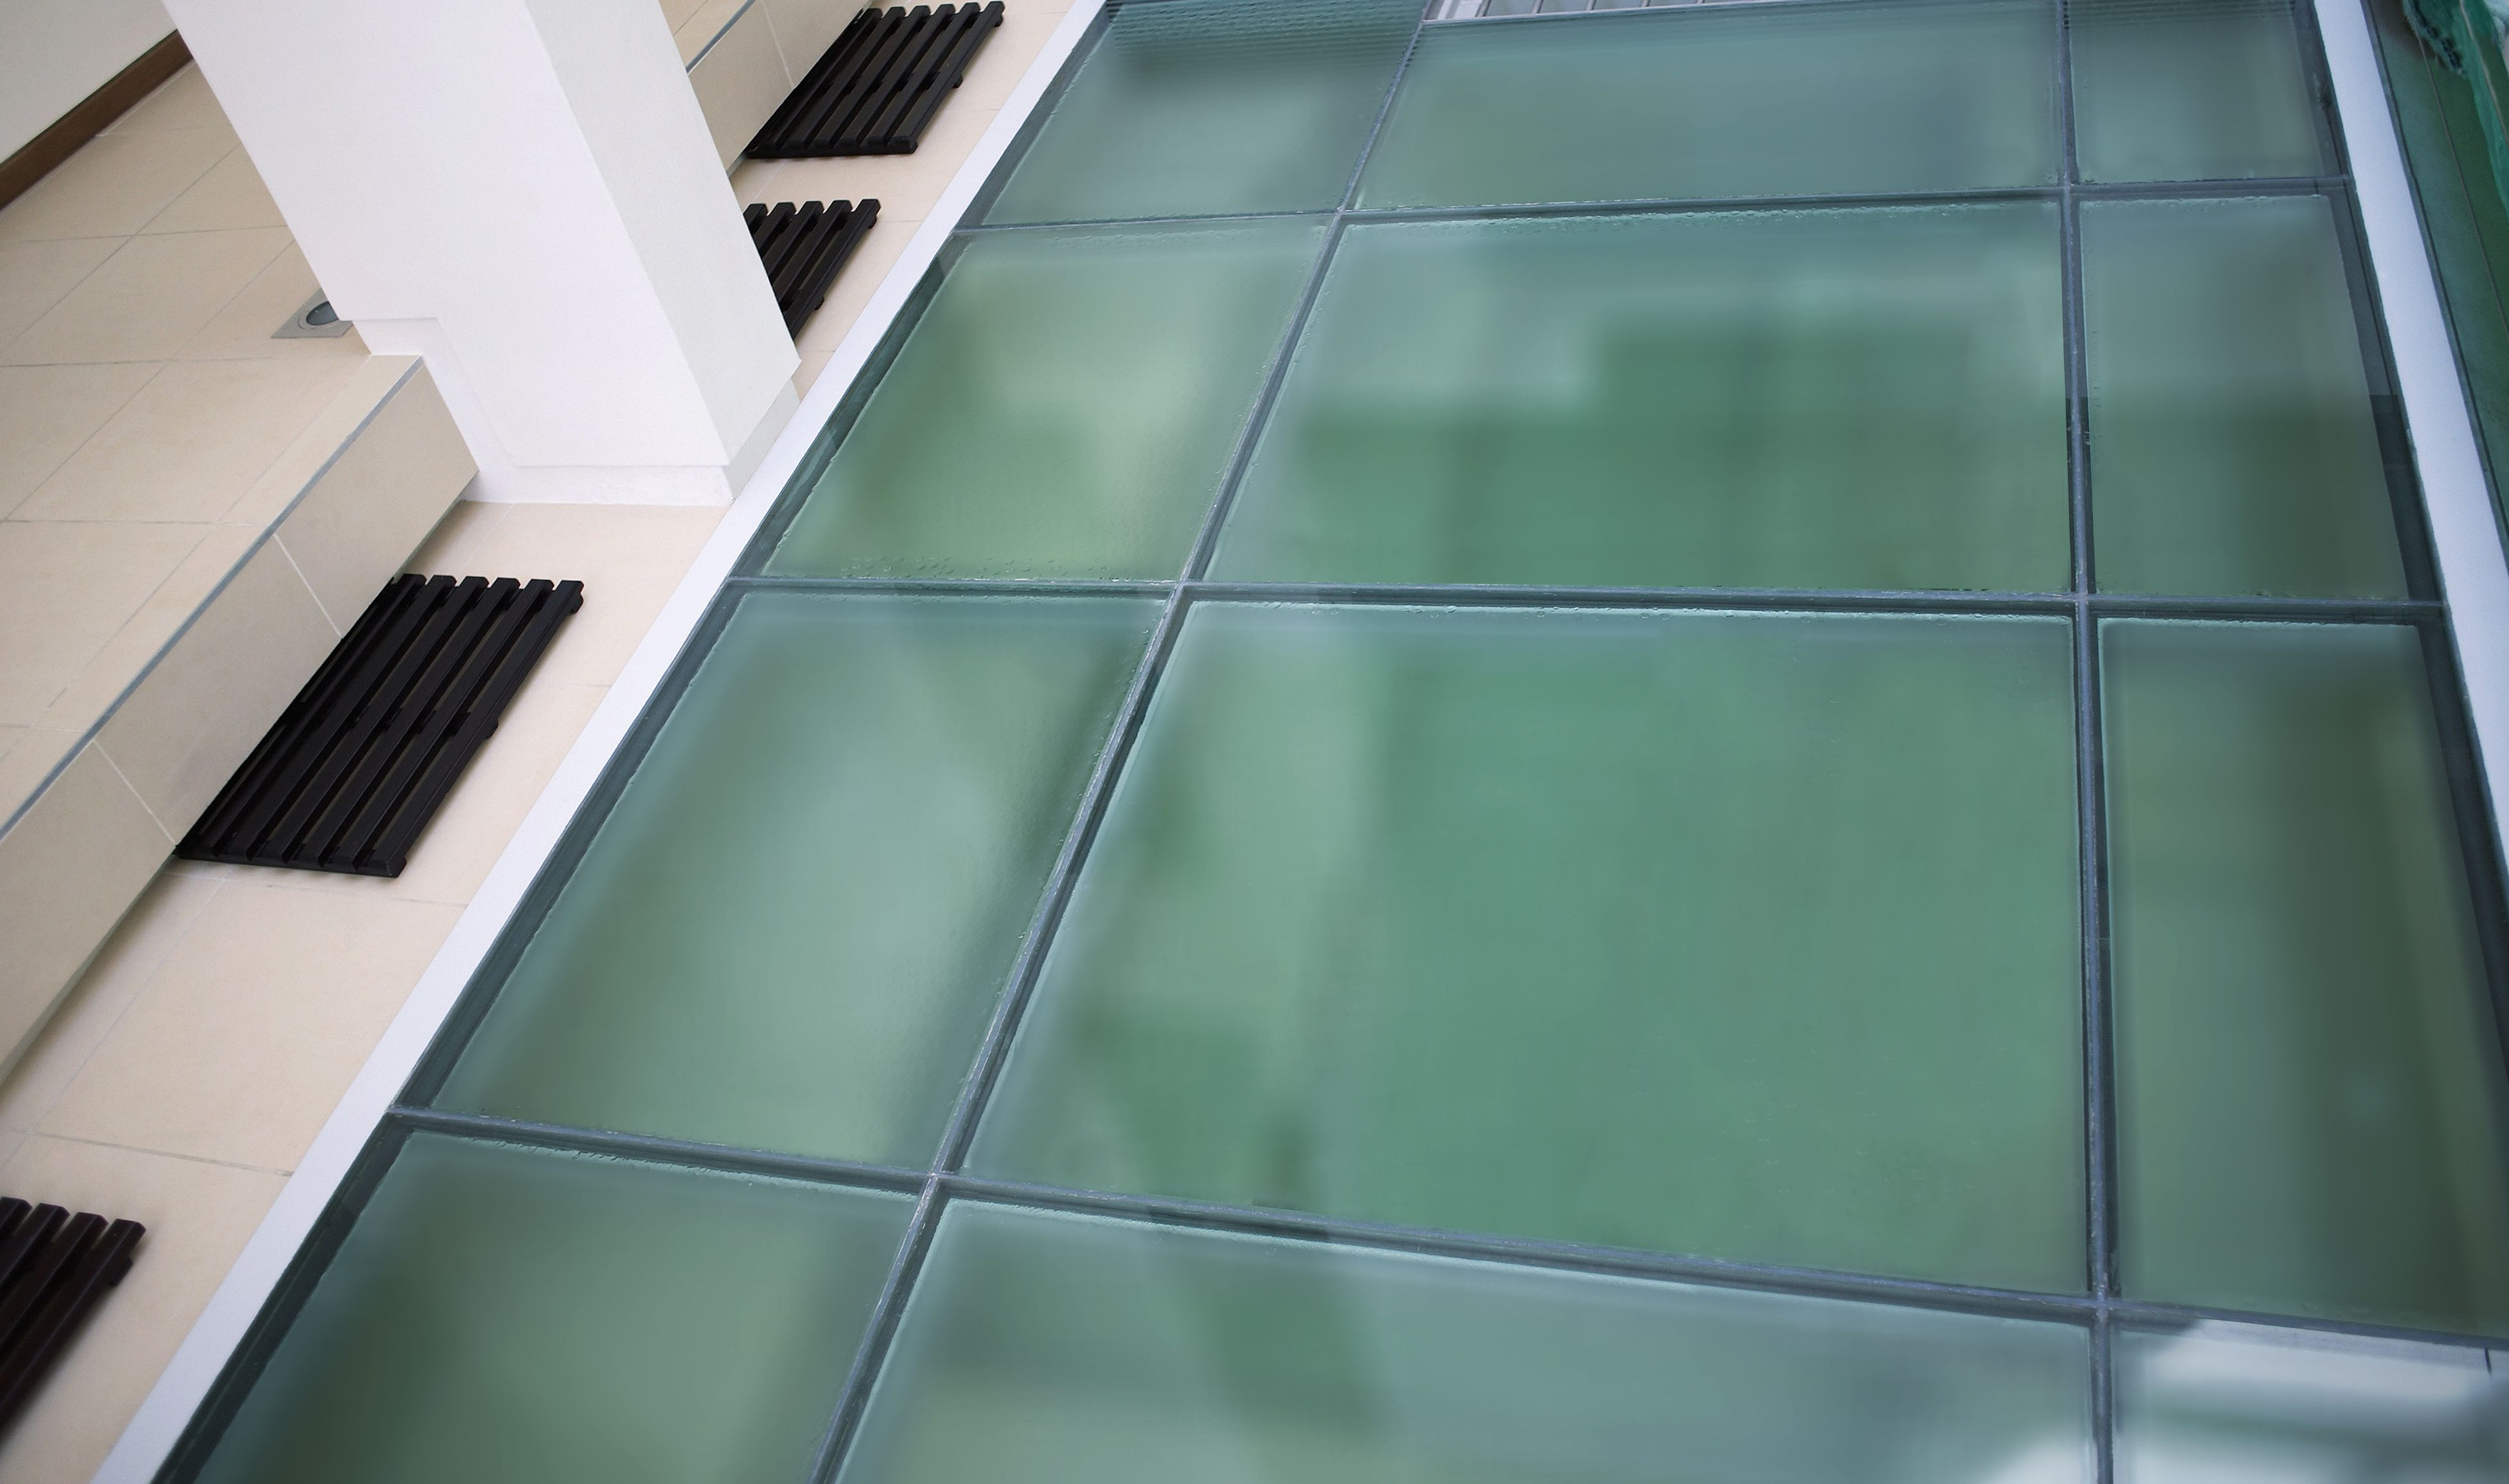 Glass Floor Laminated Flooring, Laminated Glass Flooring